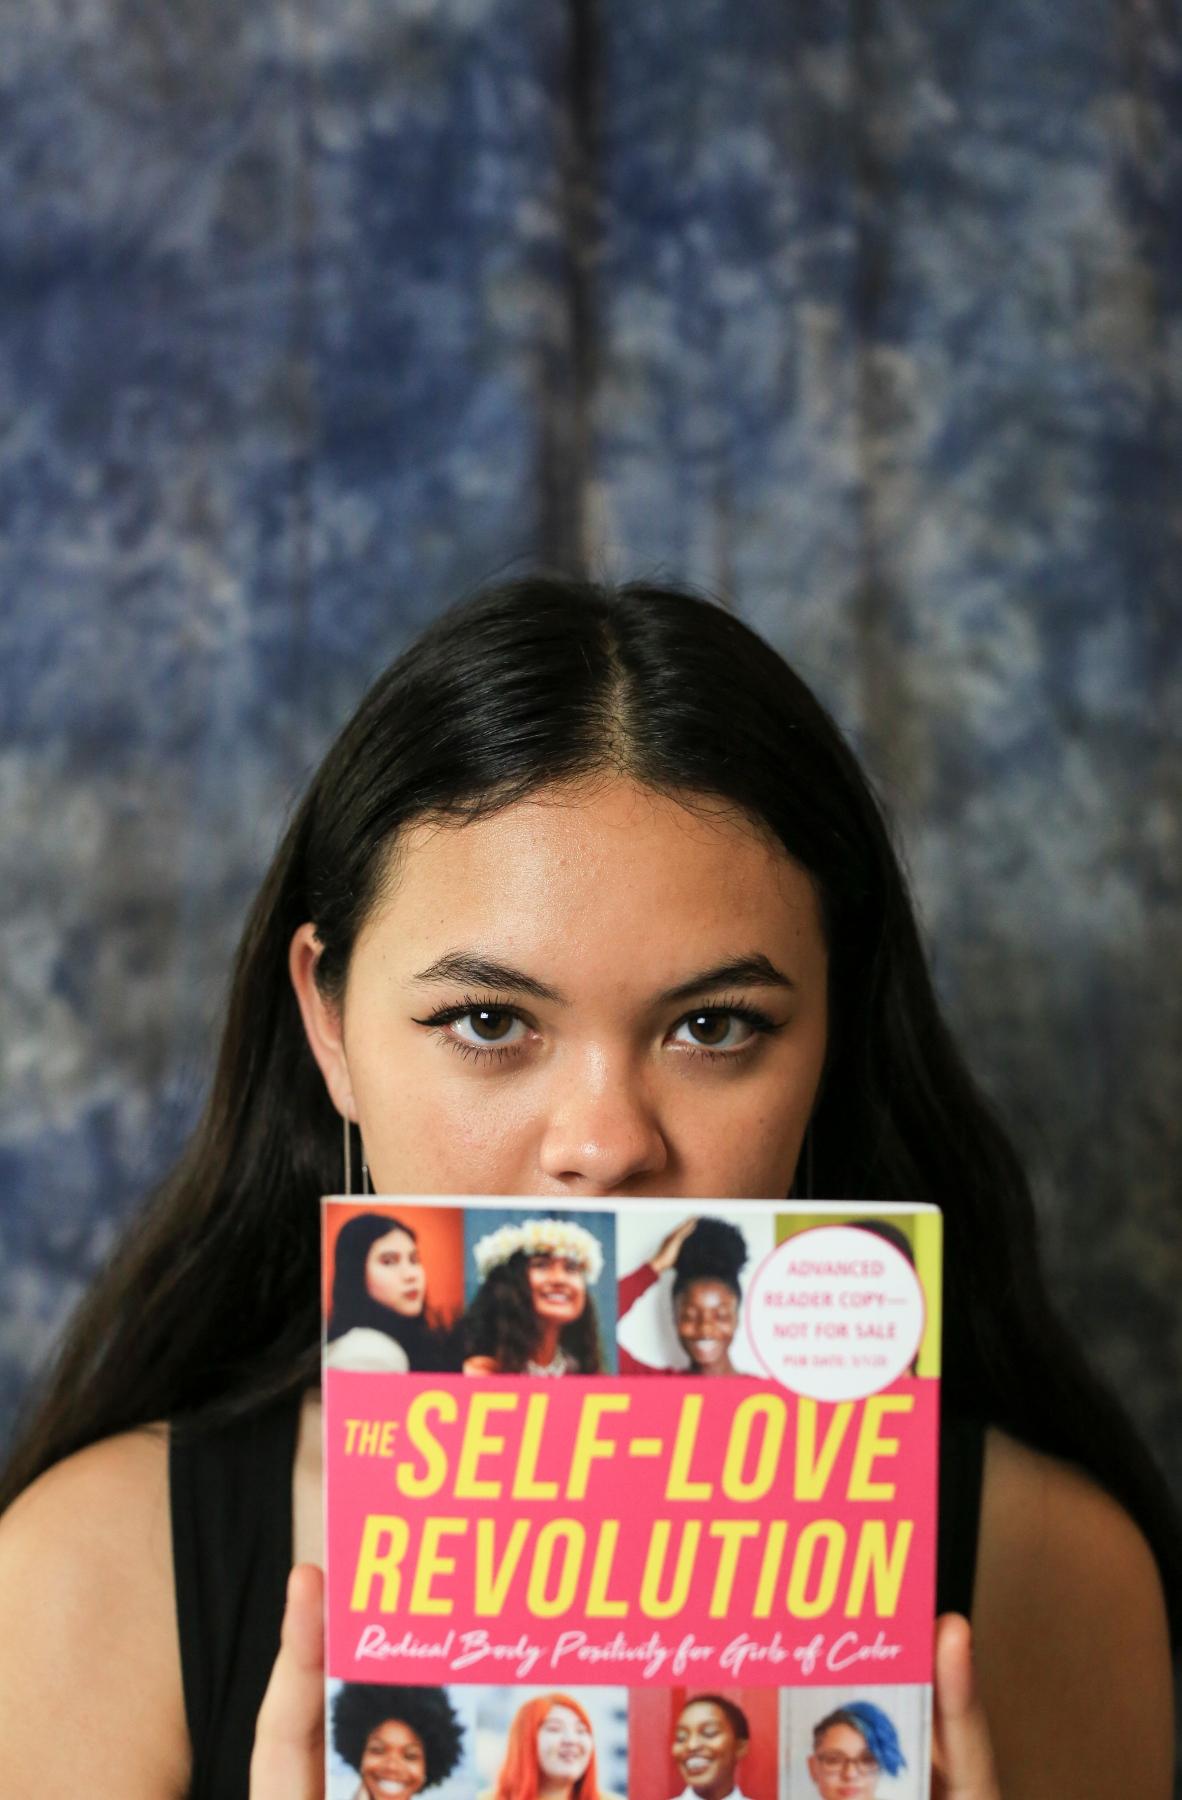 The Self-Love Revolution. Radical Body Positivity for Girls of Color. Virgie Tovar